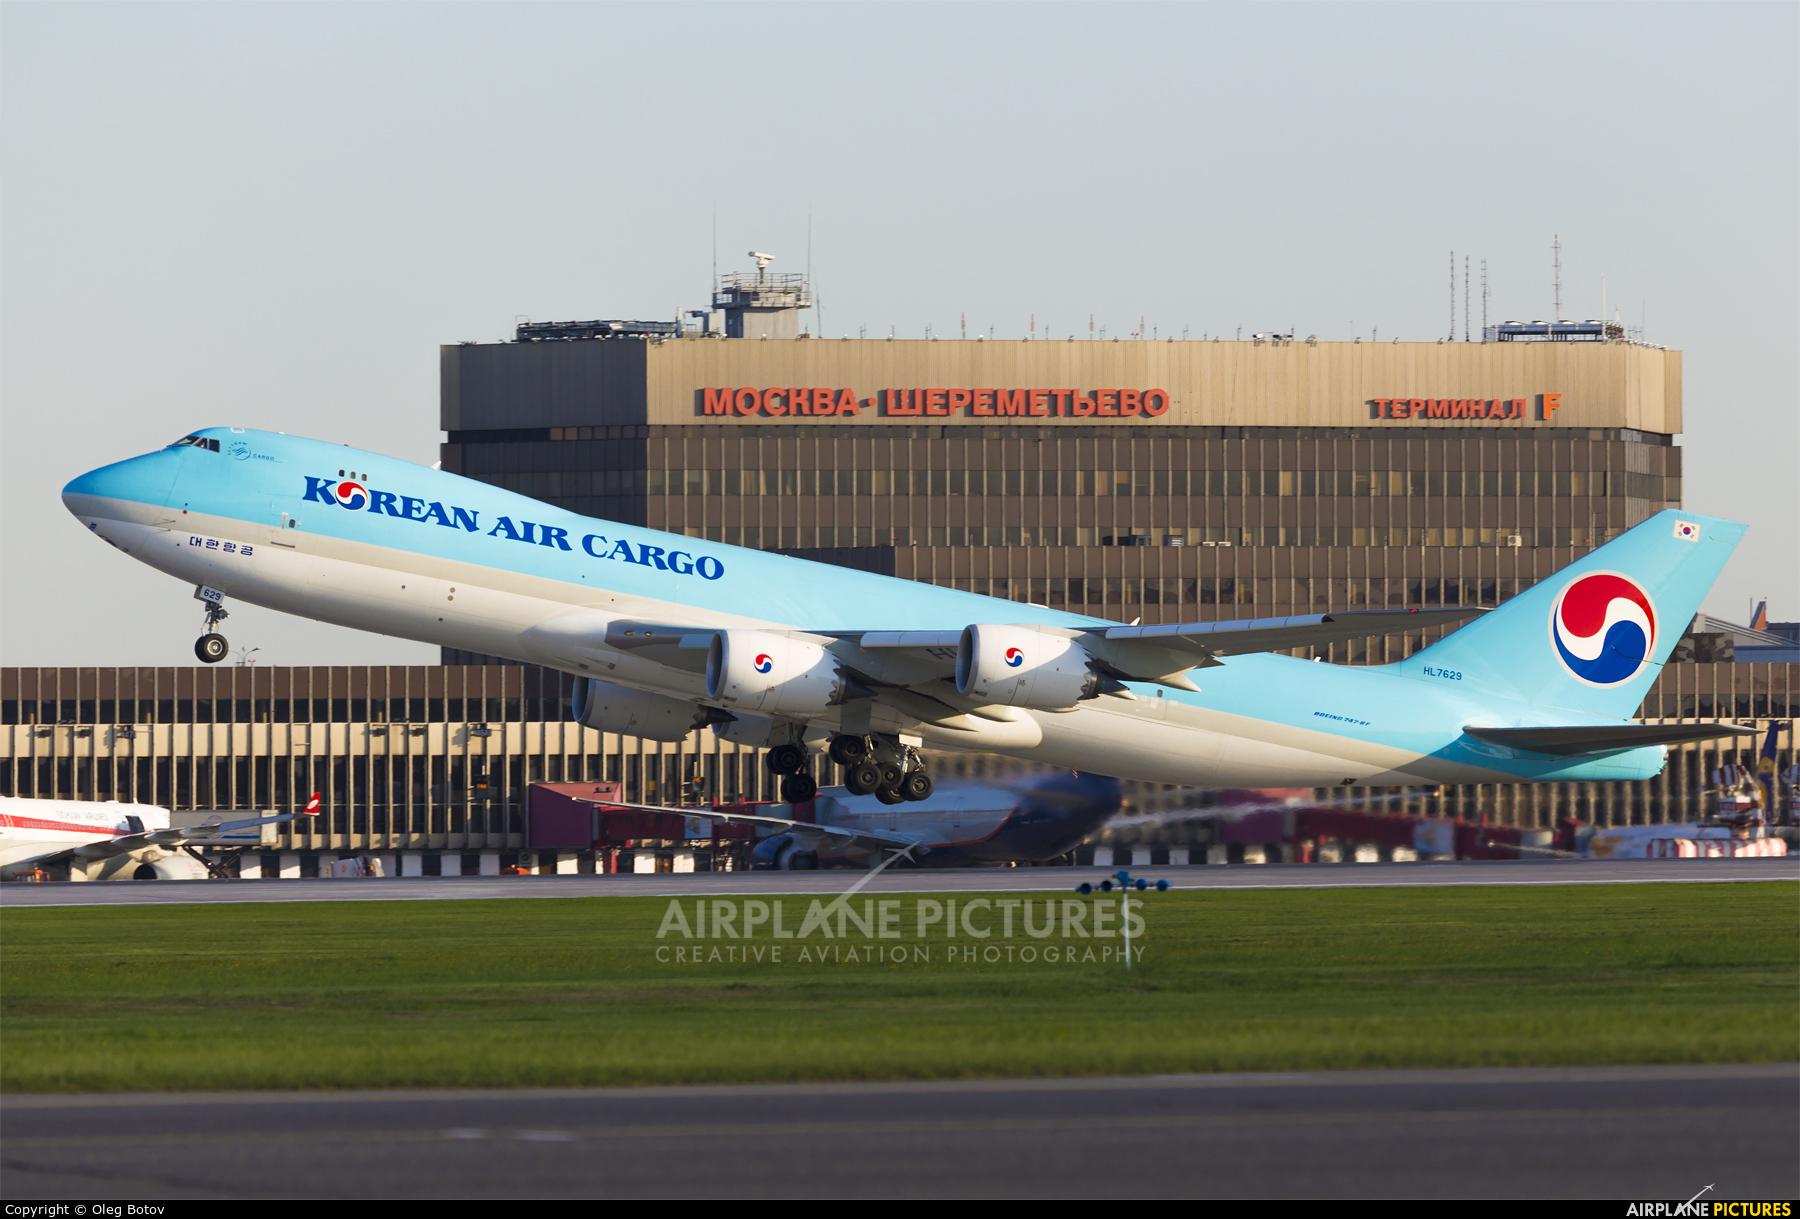 Korean Air Cargo HL7629 aircraft at Moscow - Sheremetyevo